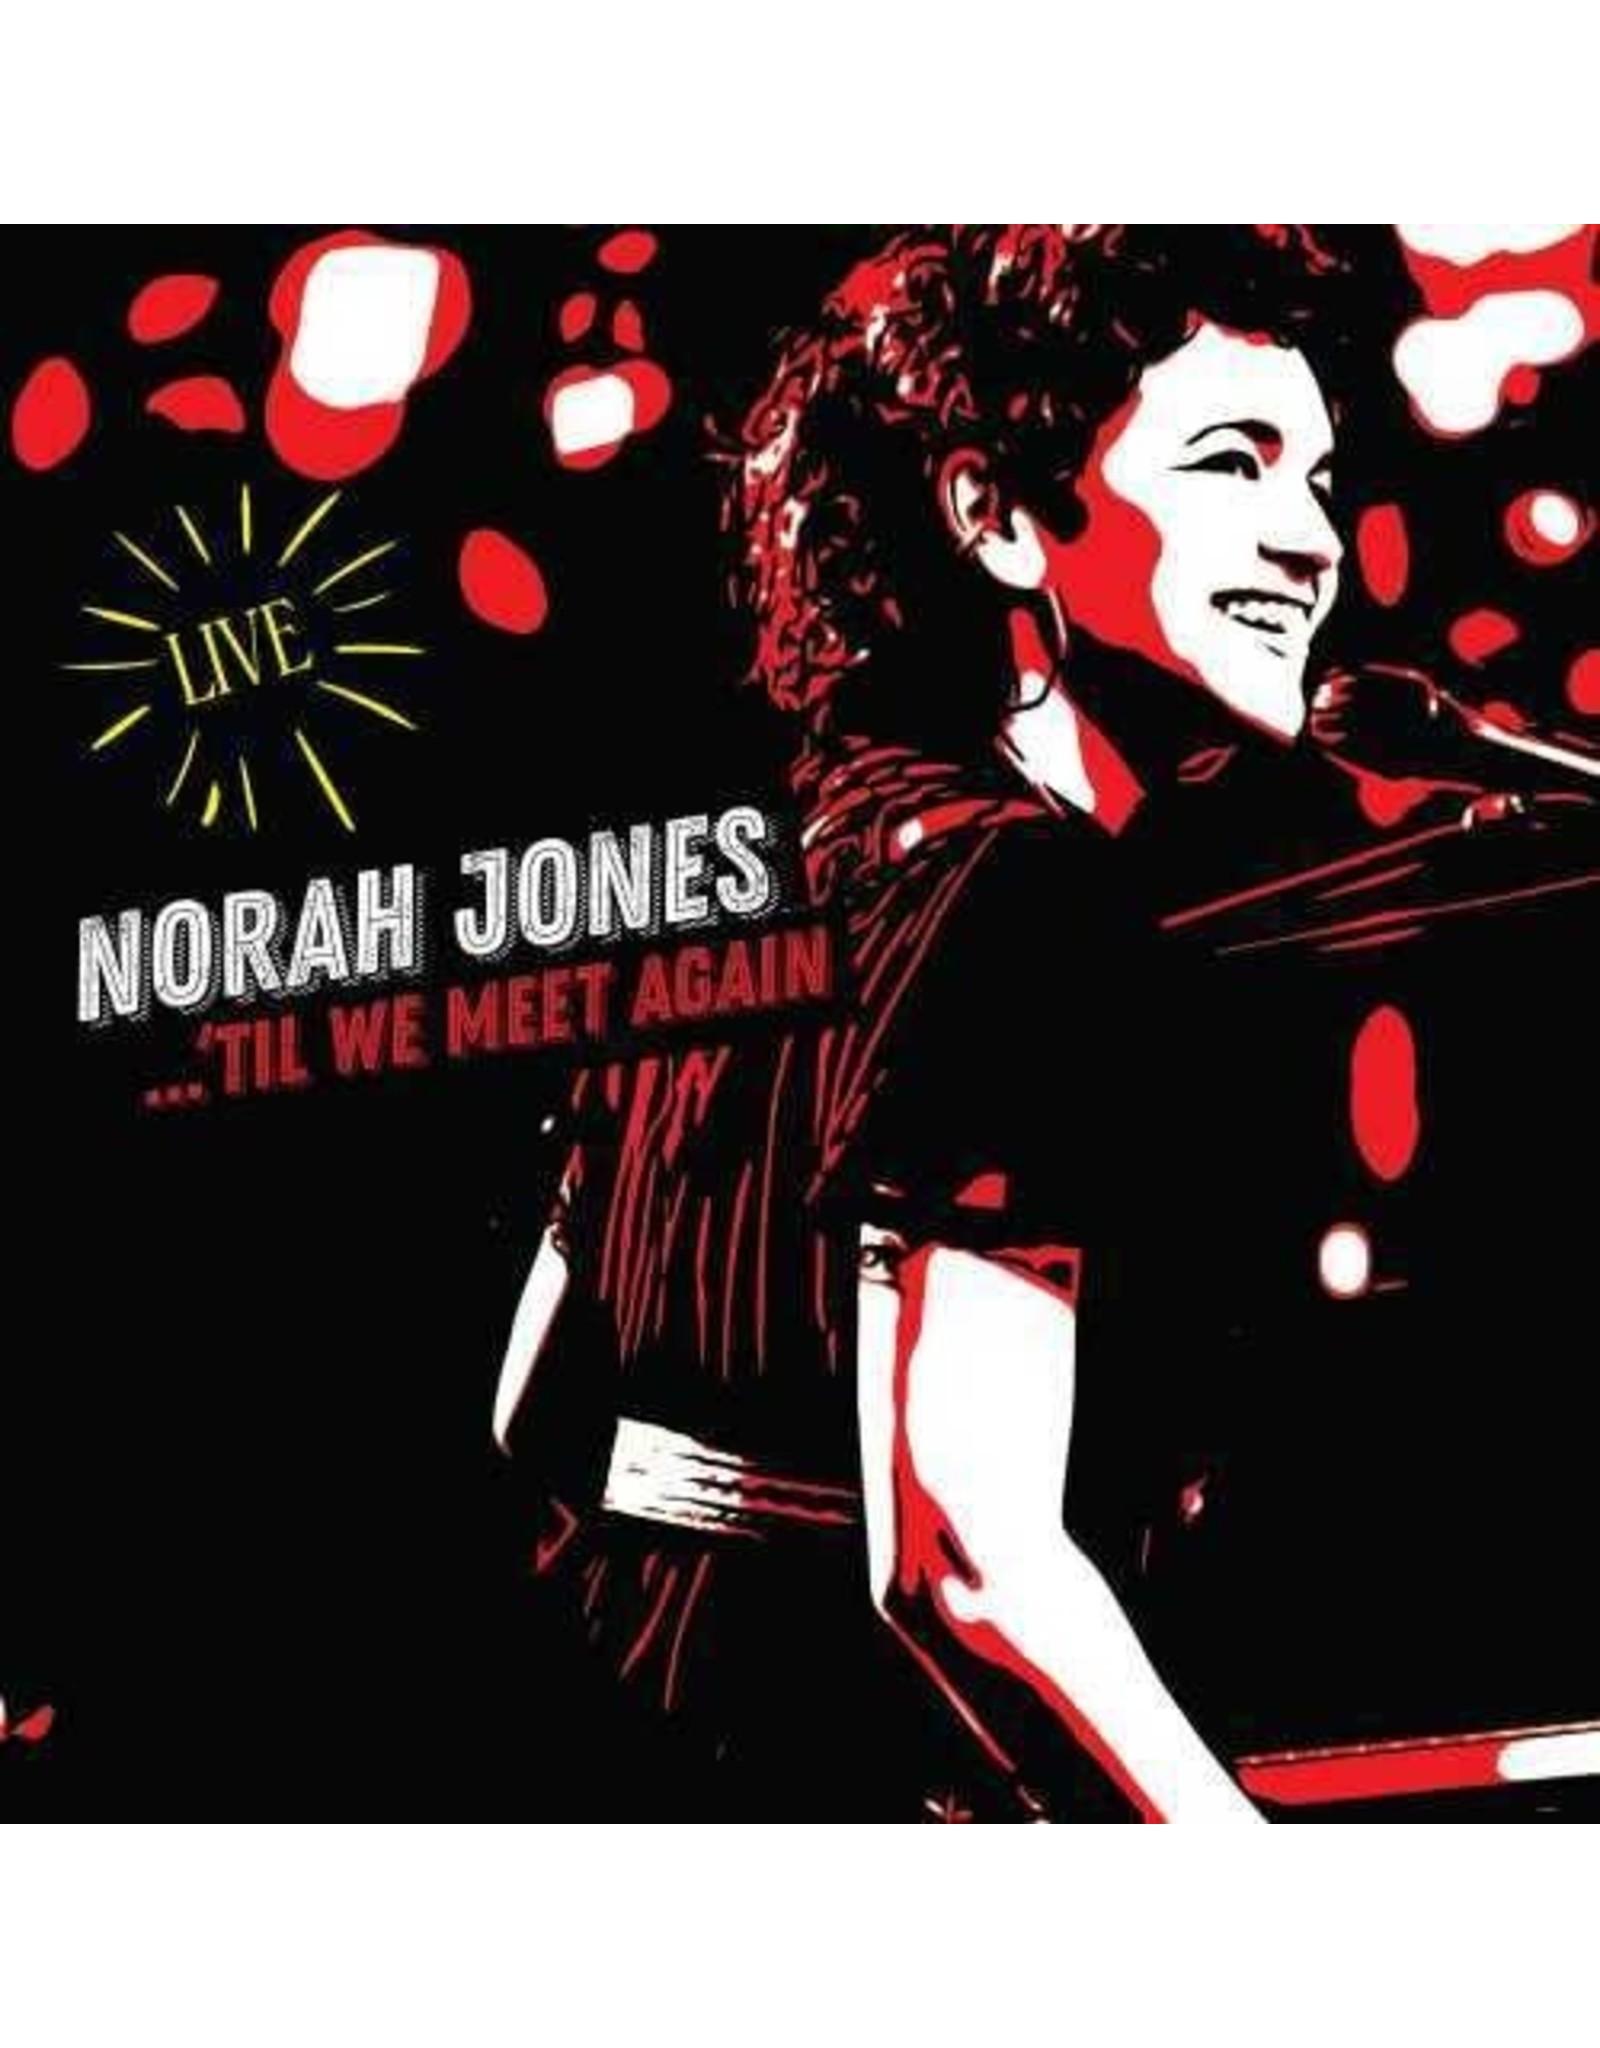 New Vinyl Norah Jones - Til We Meet Again (Live) 2LP